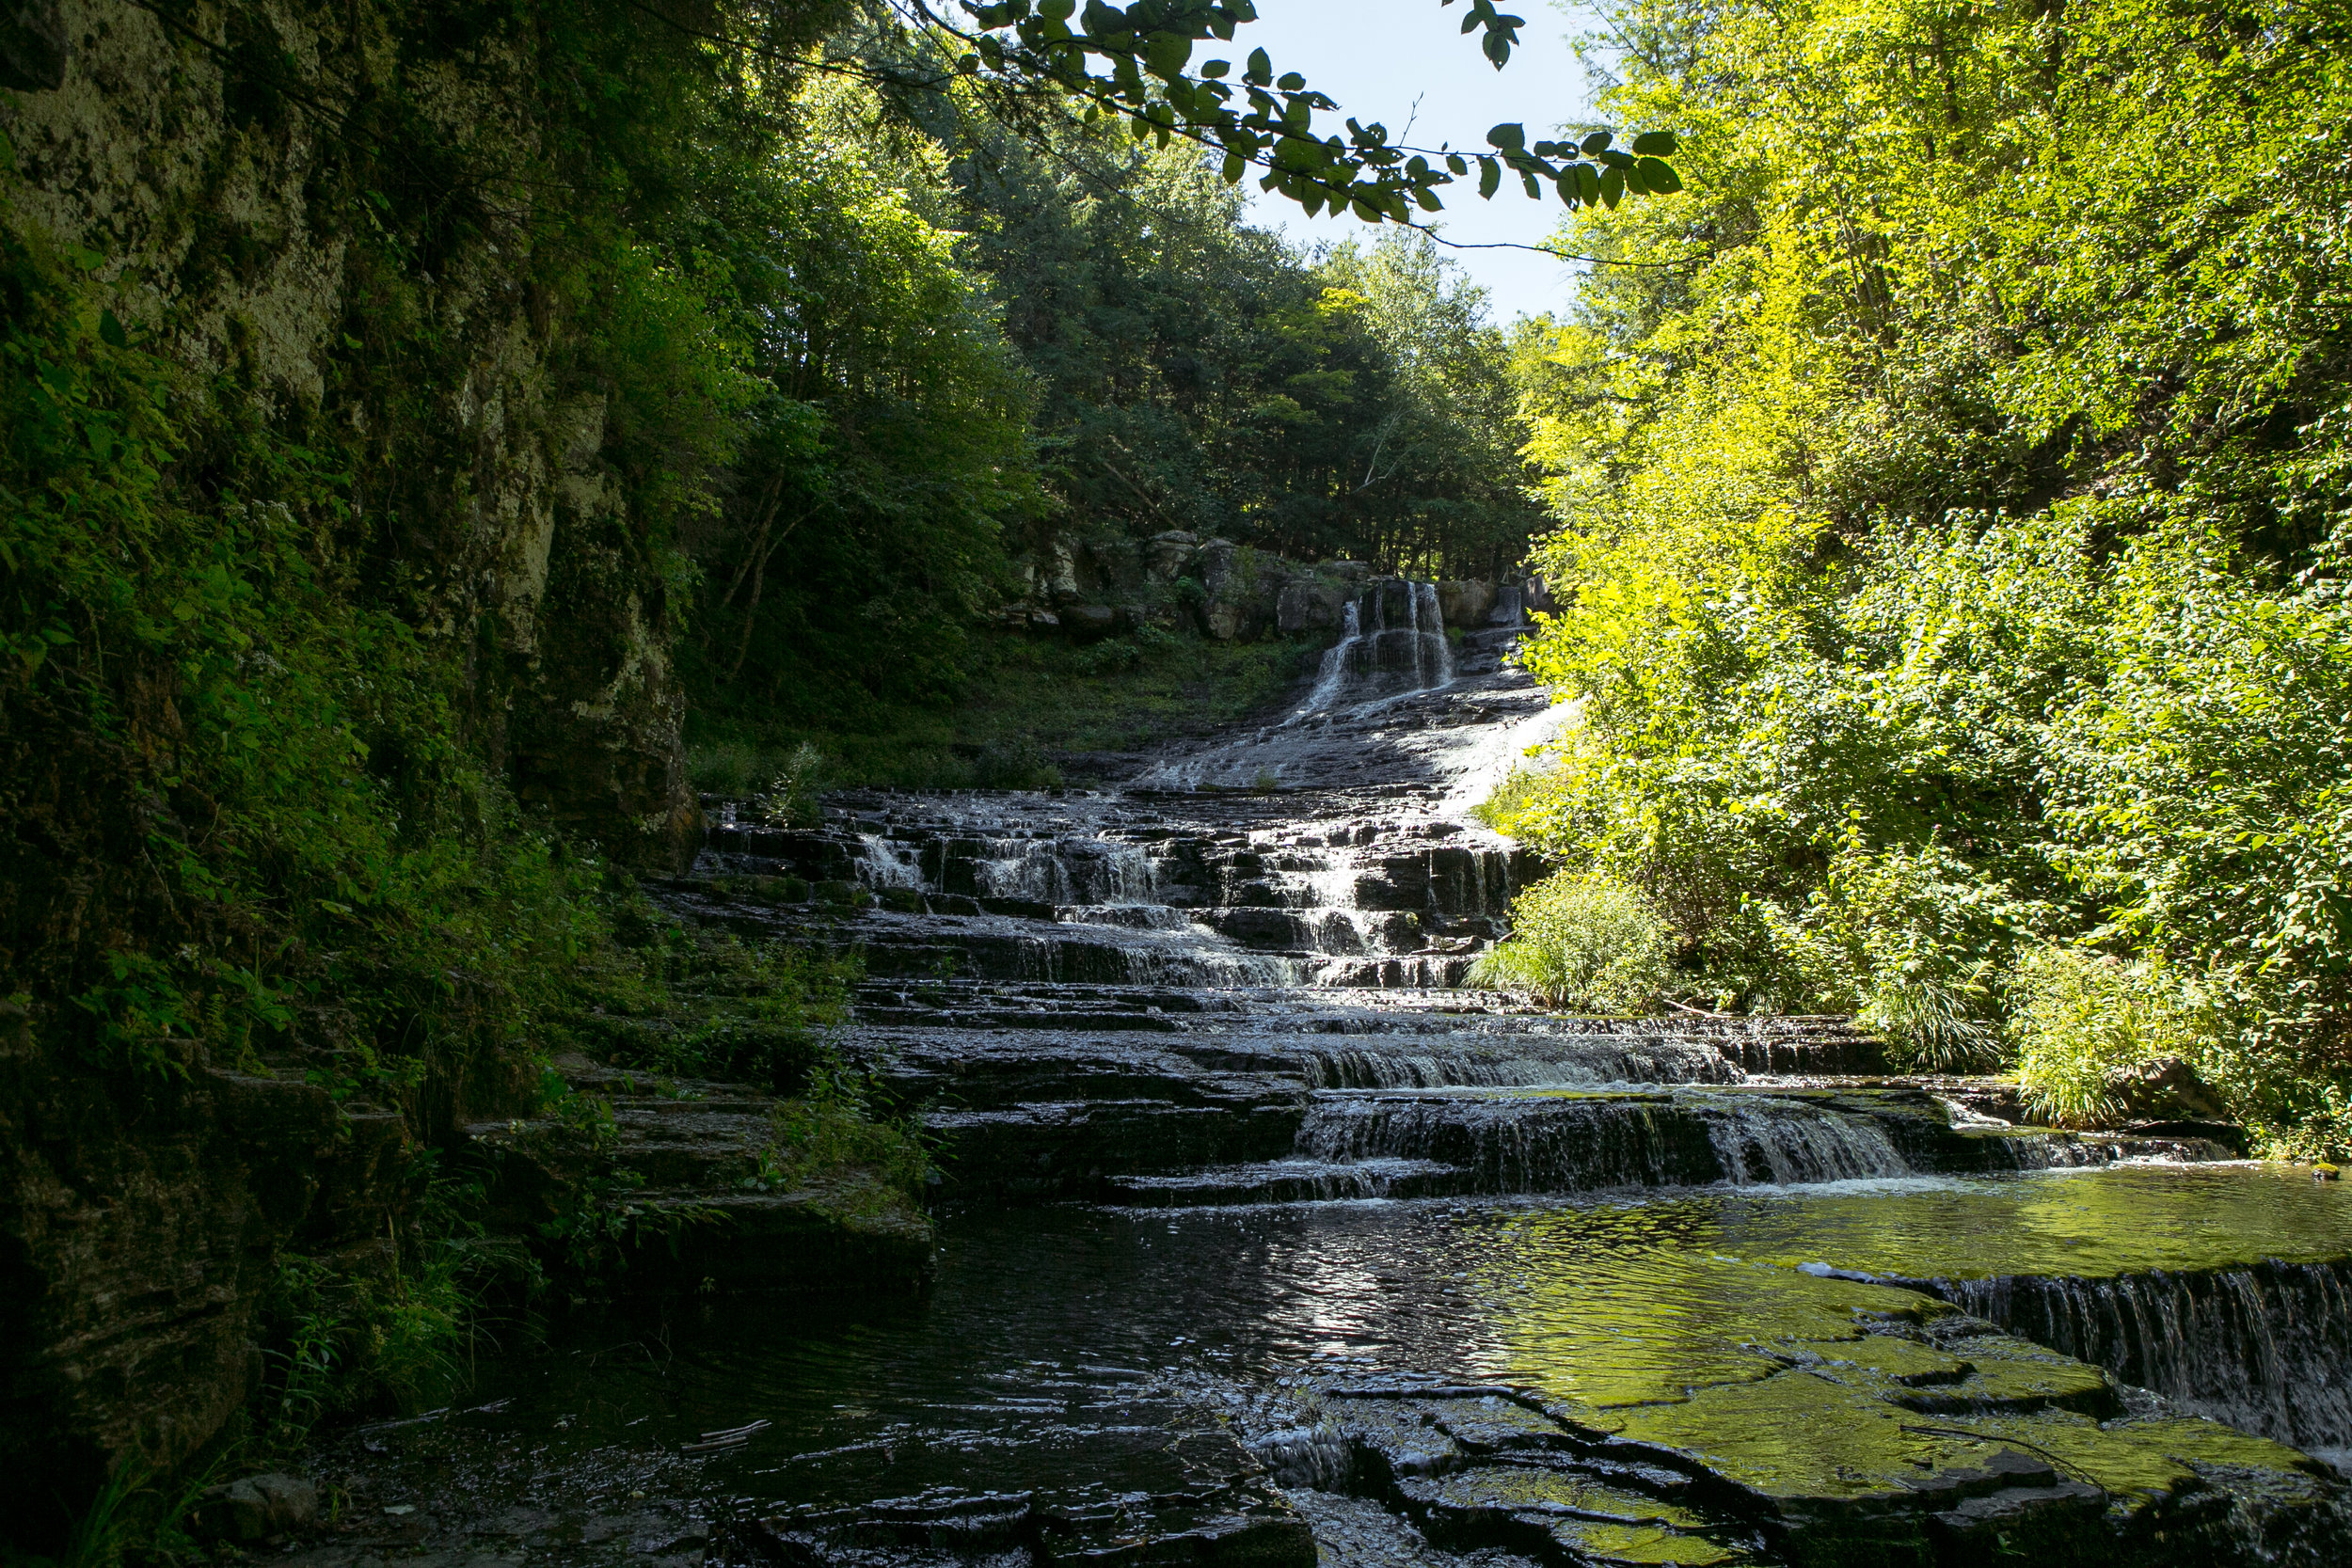 lower falls phenology trail hike-5.jpg